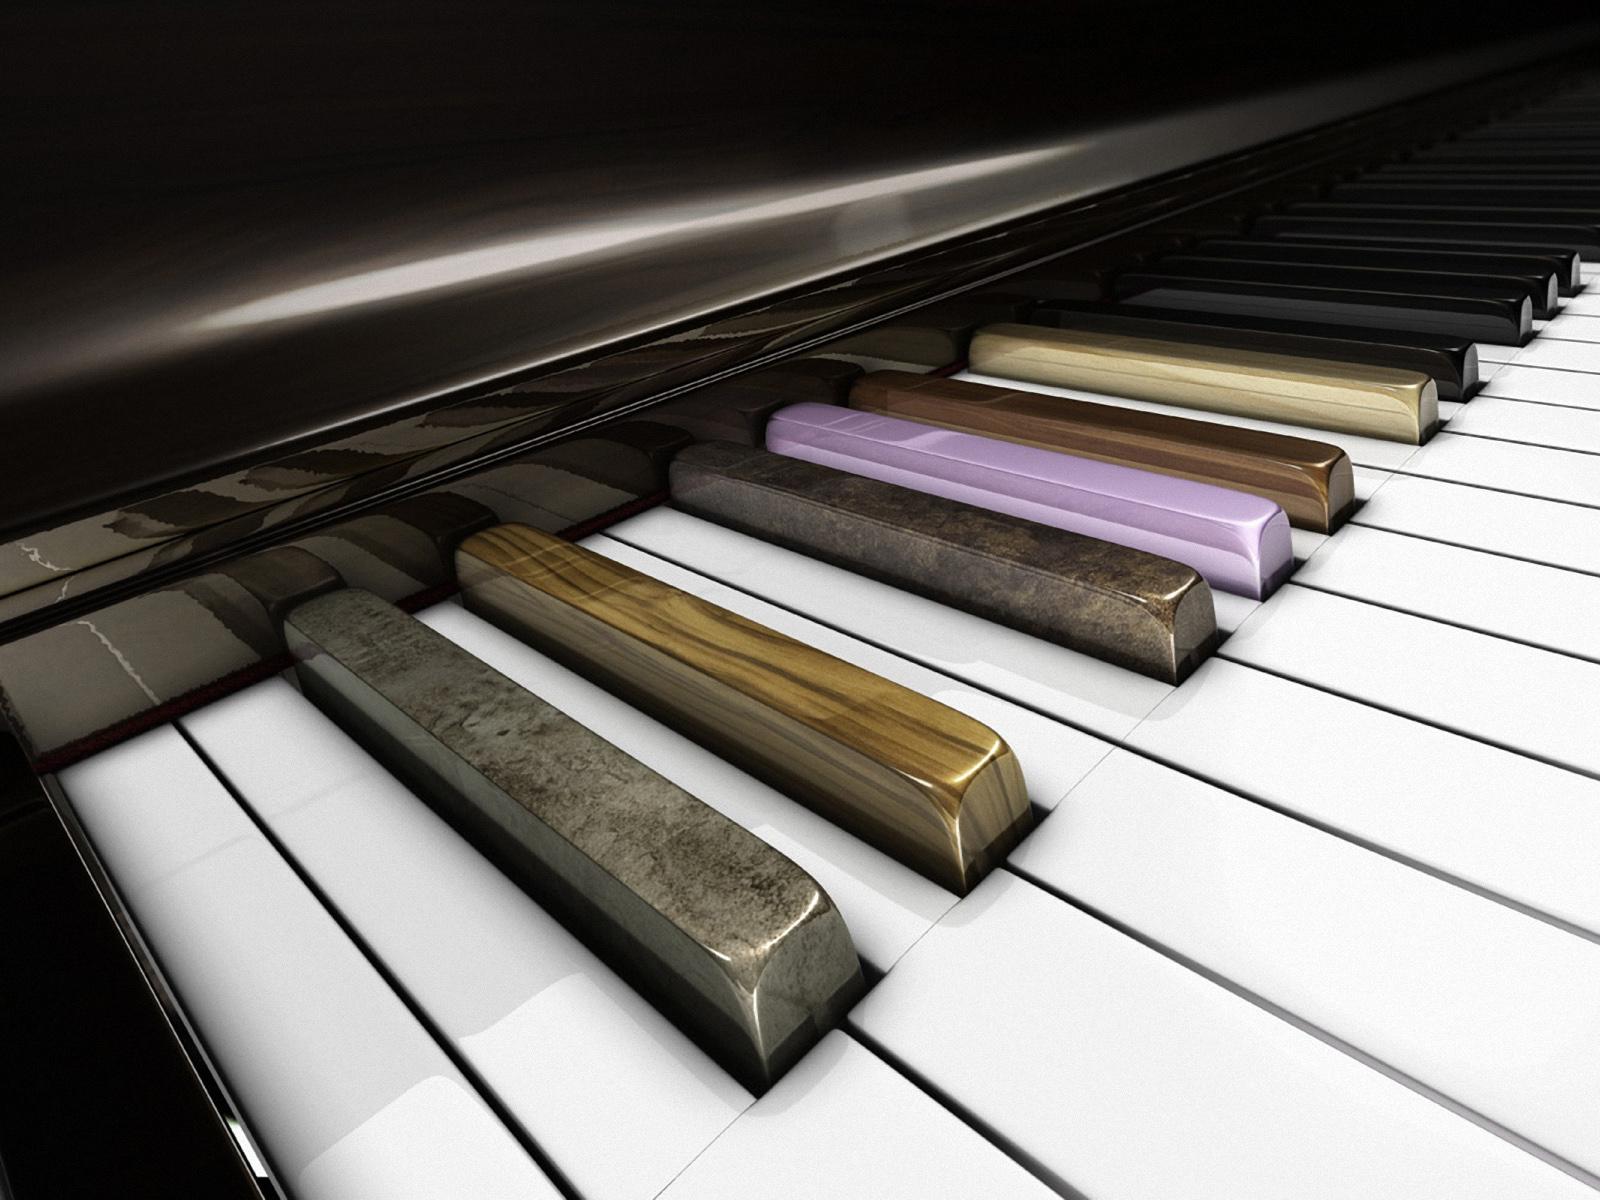 instruments keyboard wallpaper - photo #46